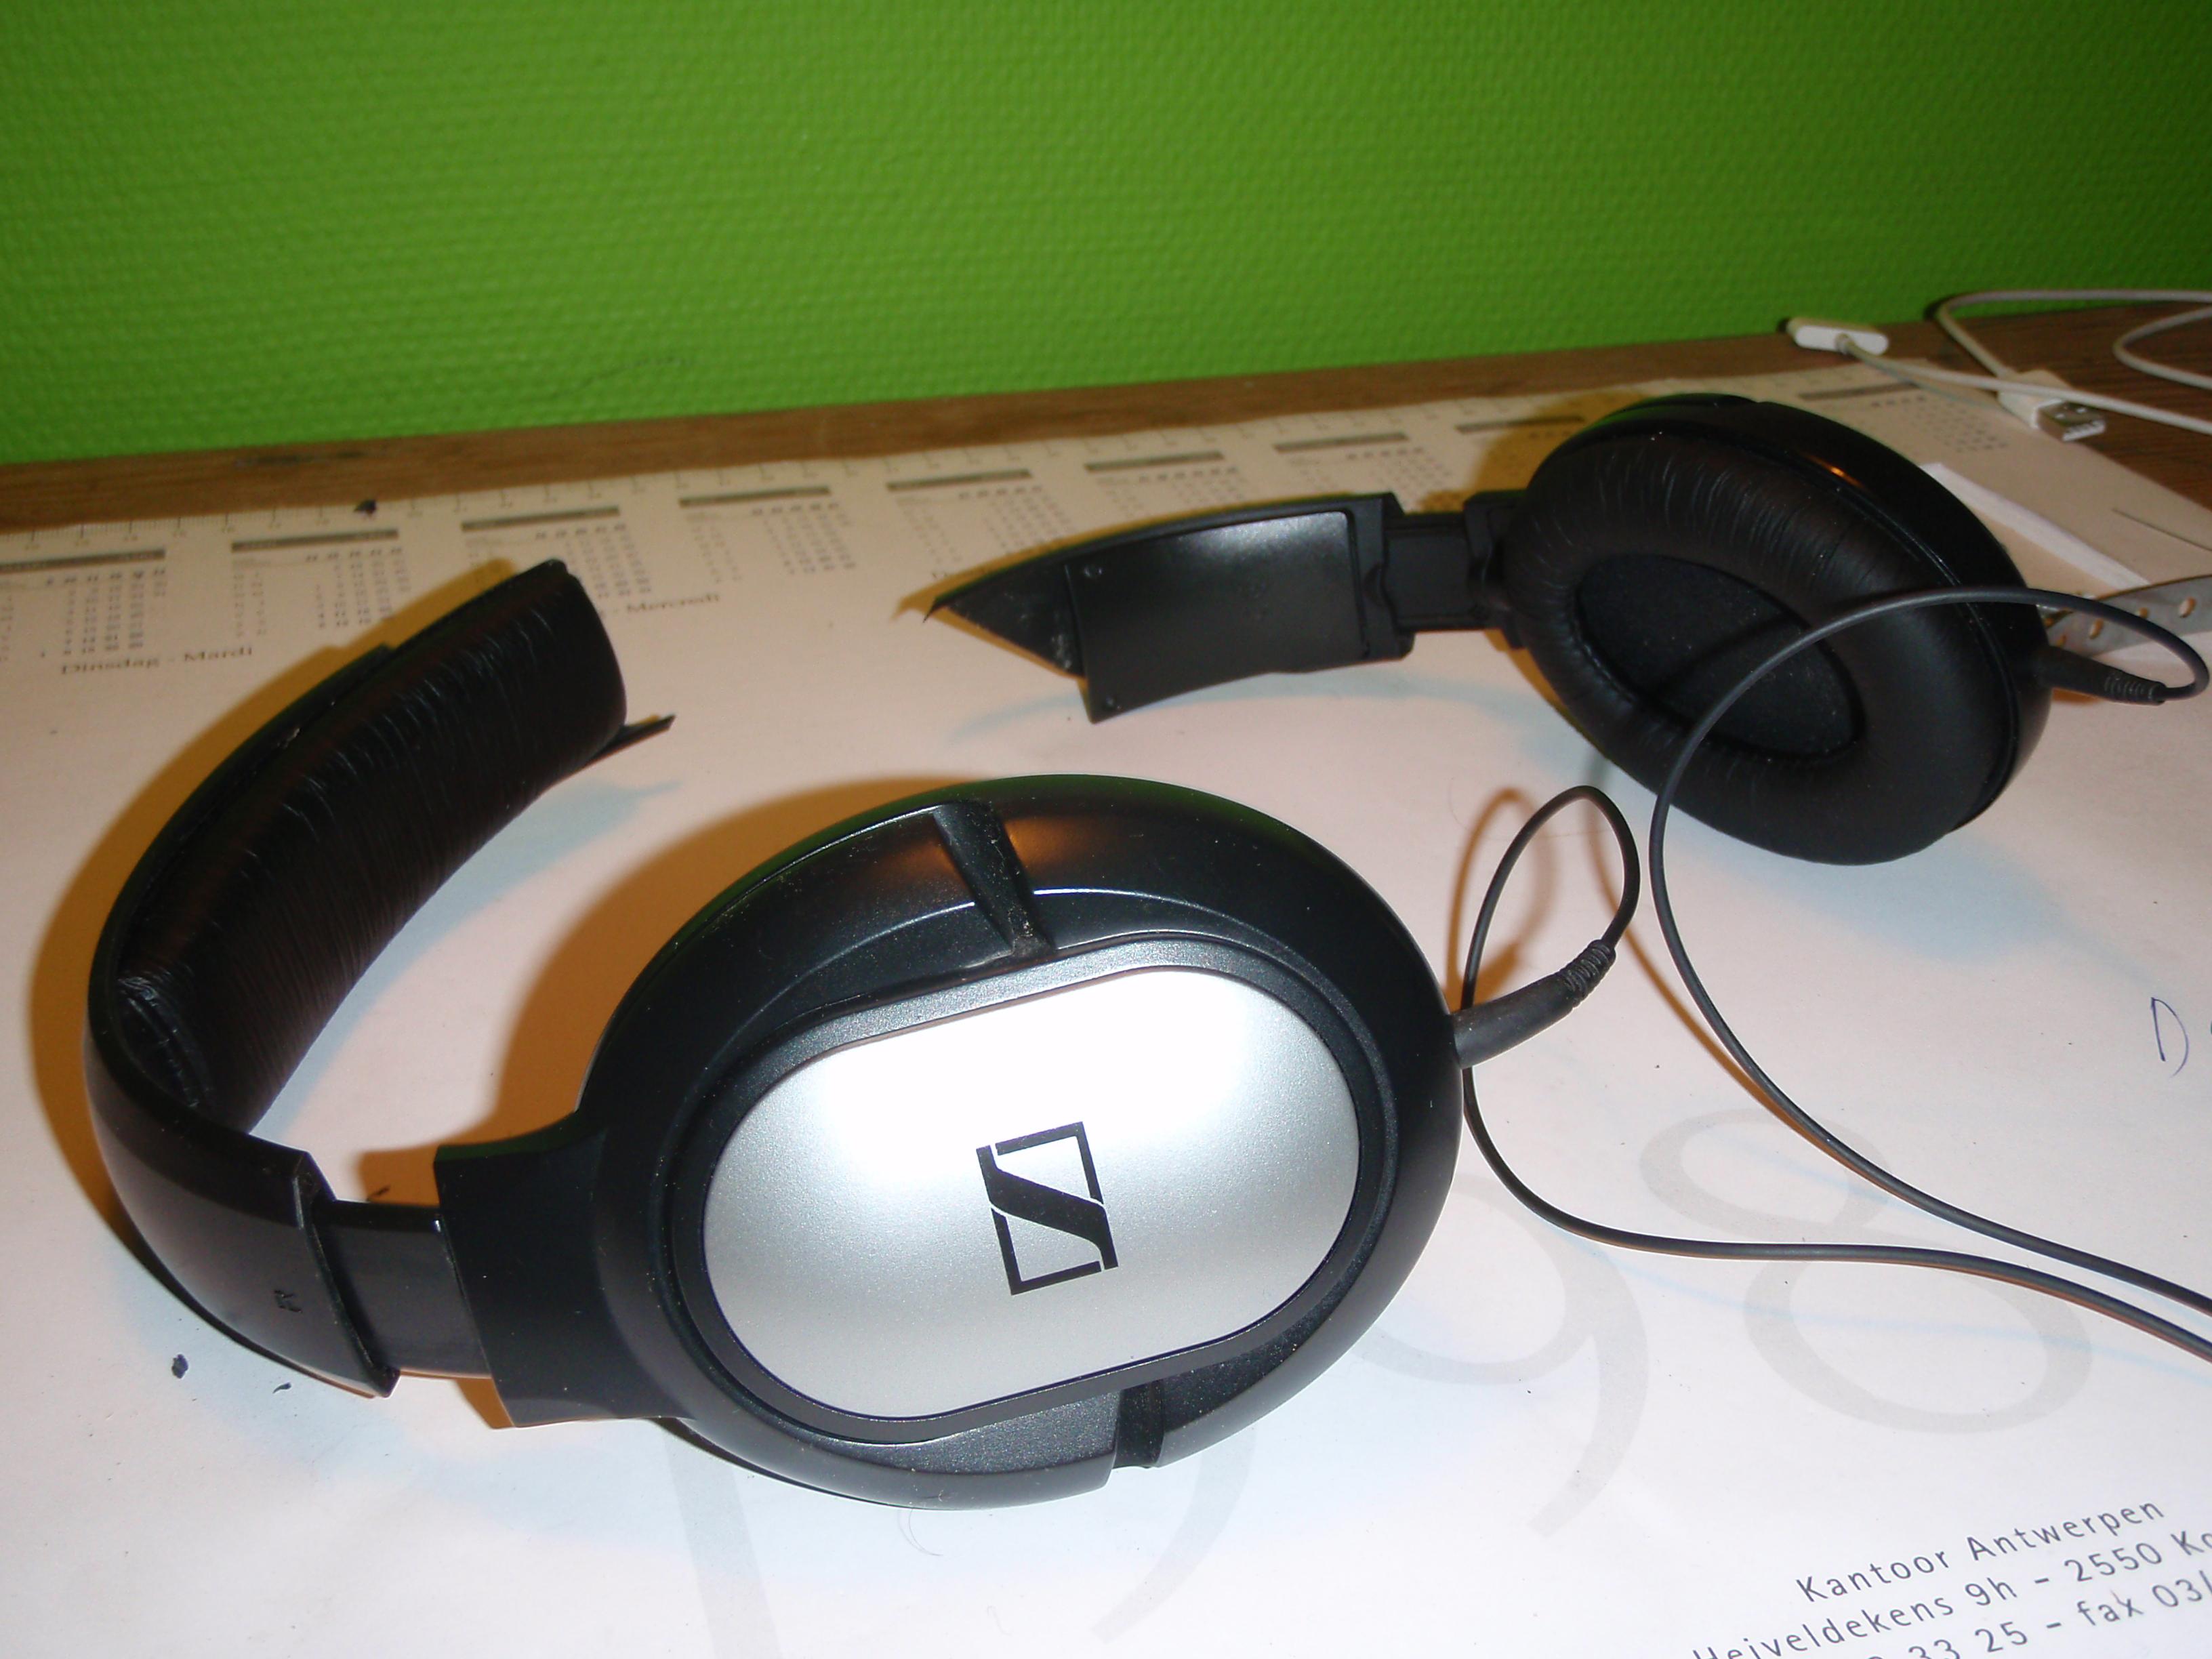 Repair your broken headphones using Meccano